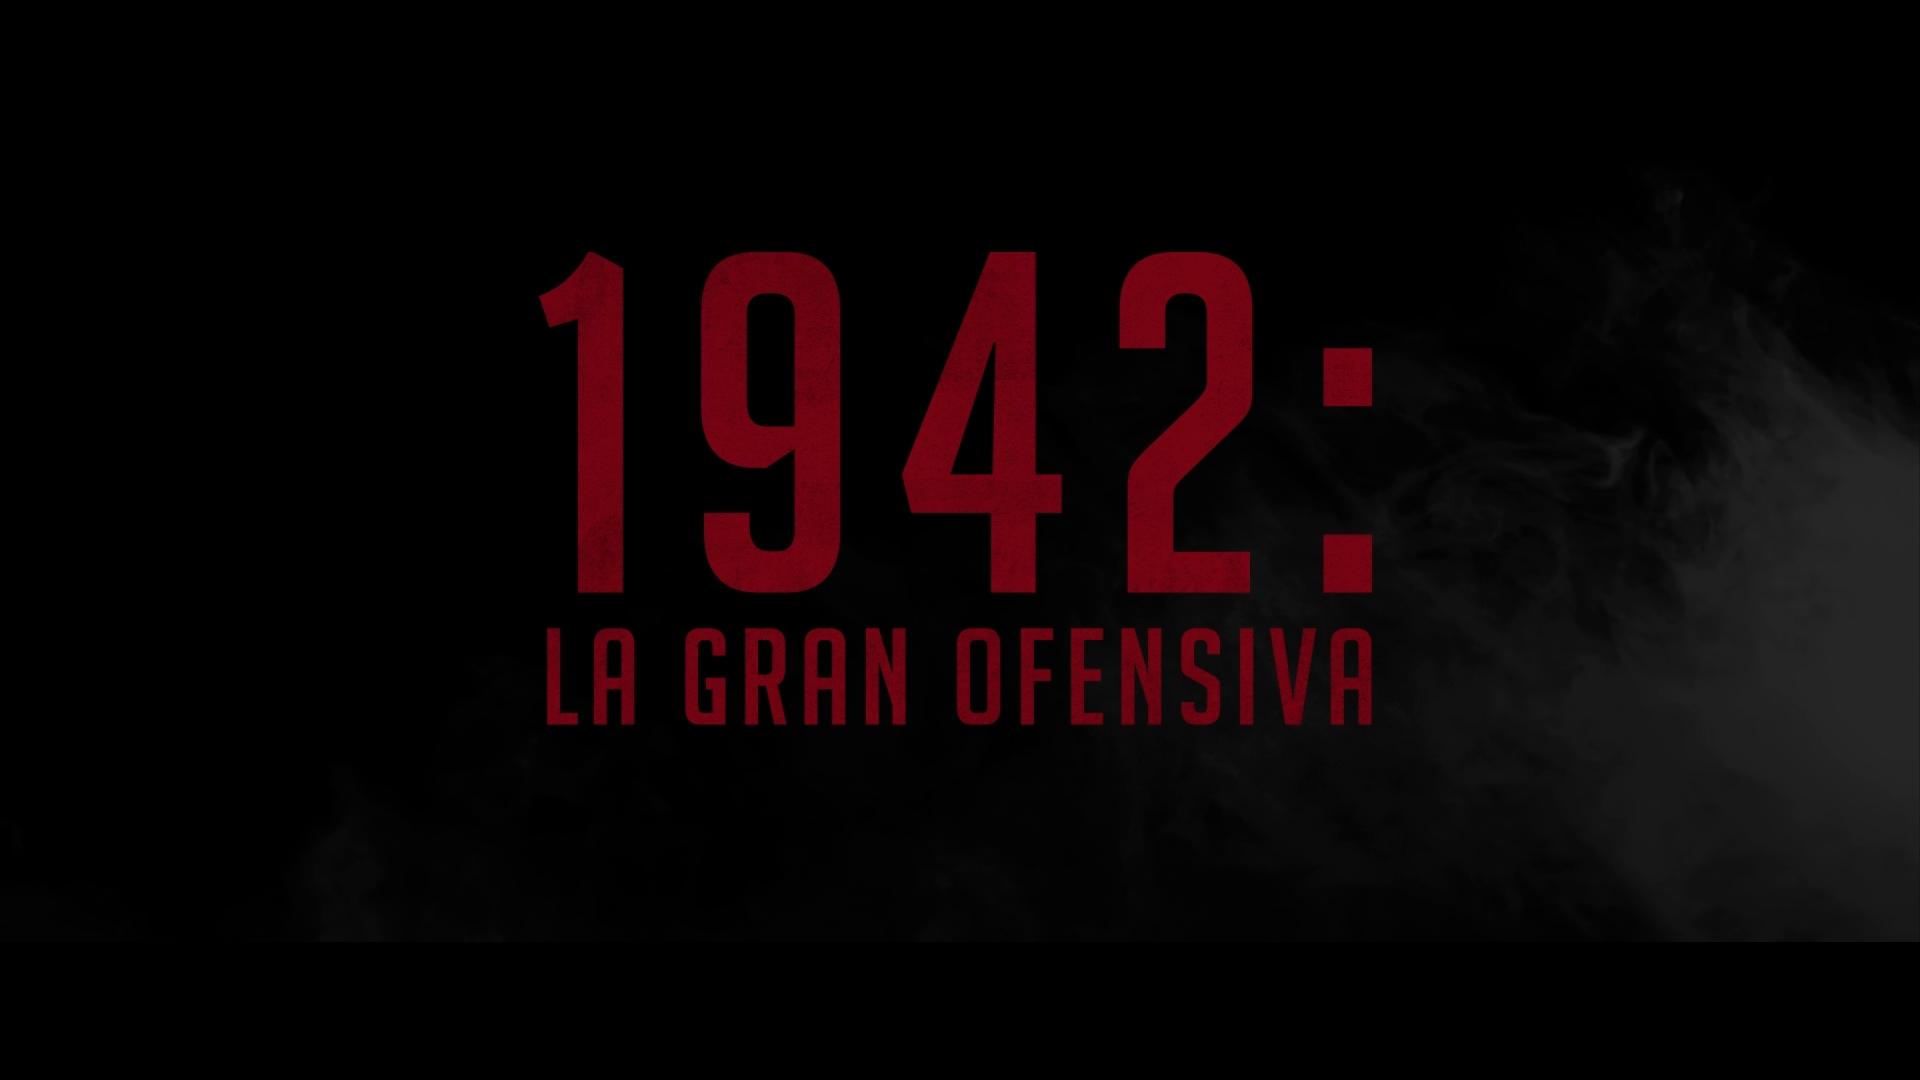 1942: La gran ofensiva (2019) 1080p BDRip